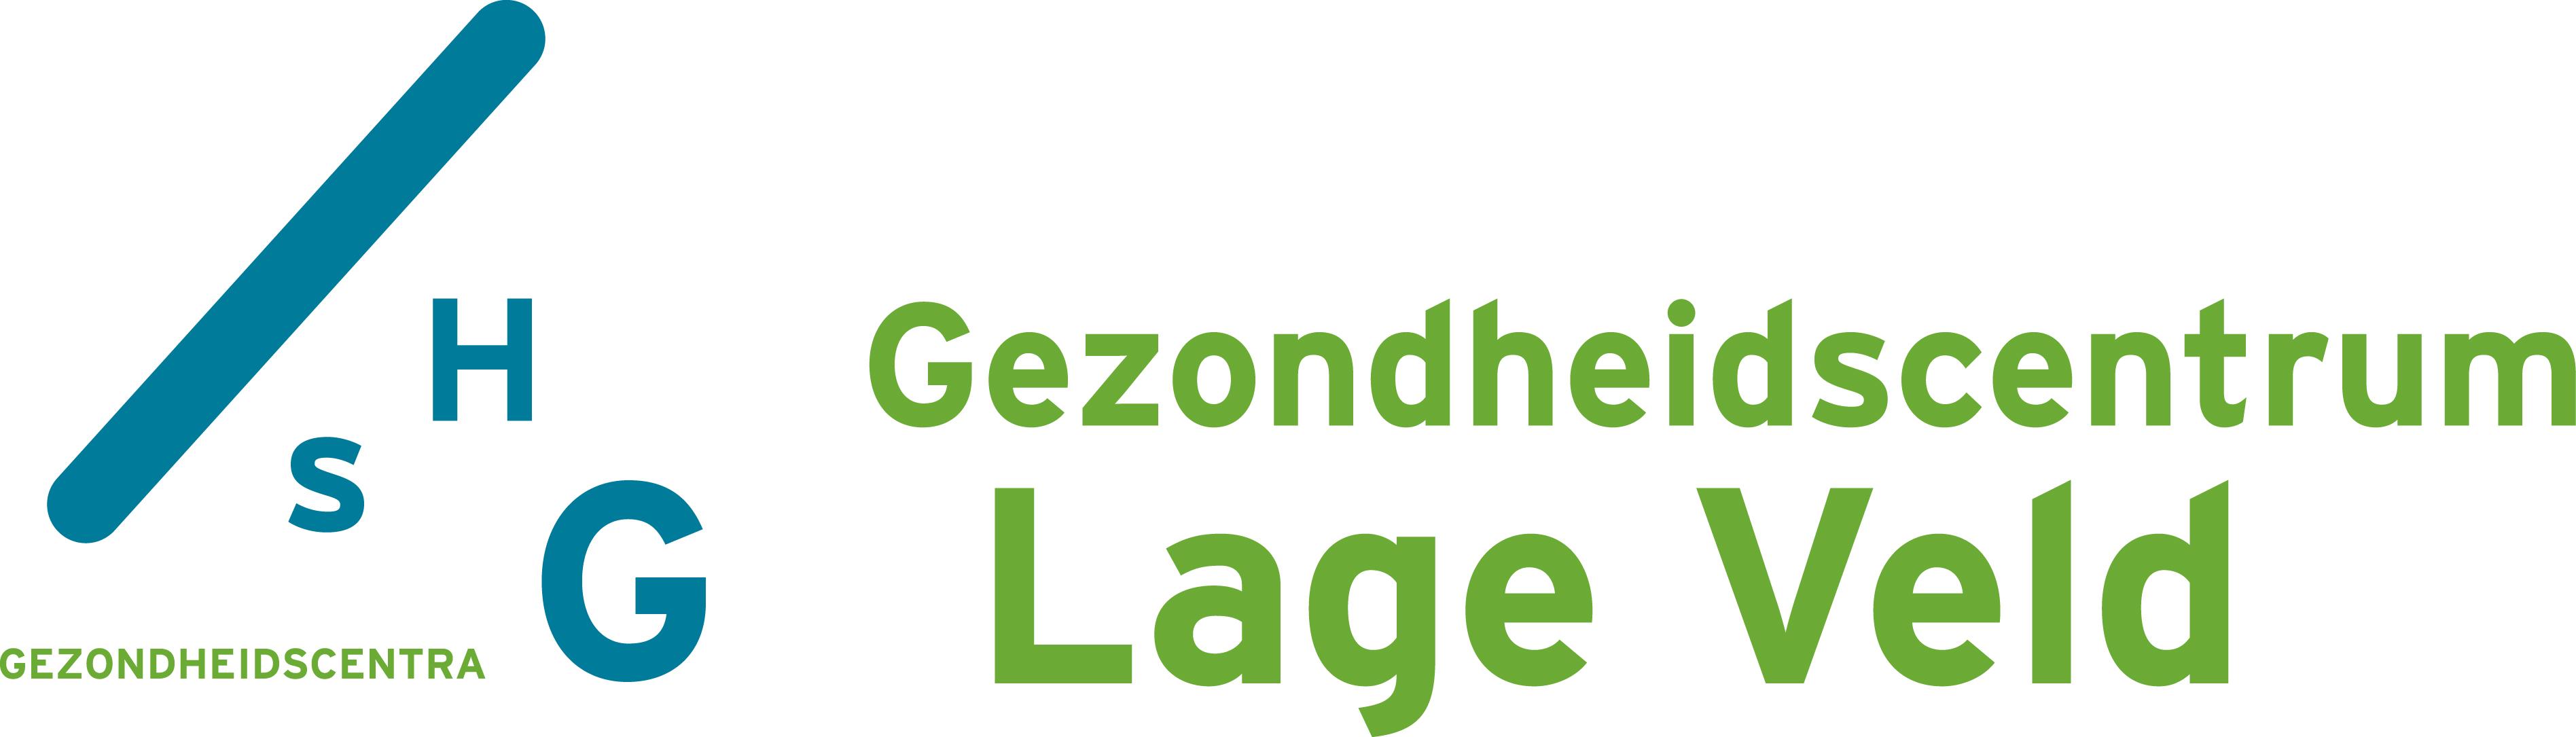 Gezondheidscentrum Lage Veld